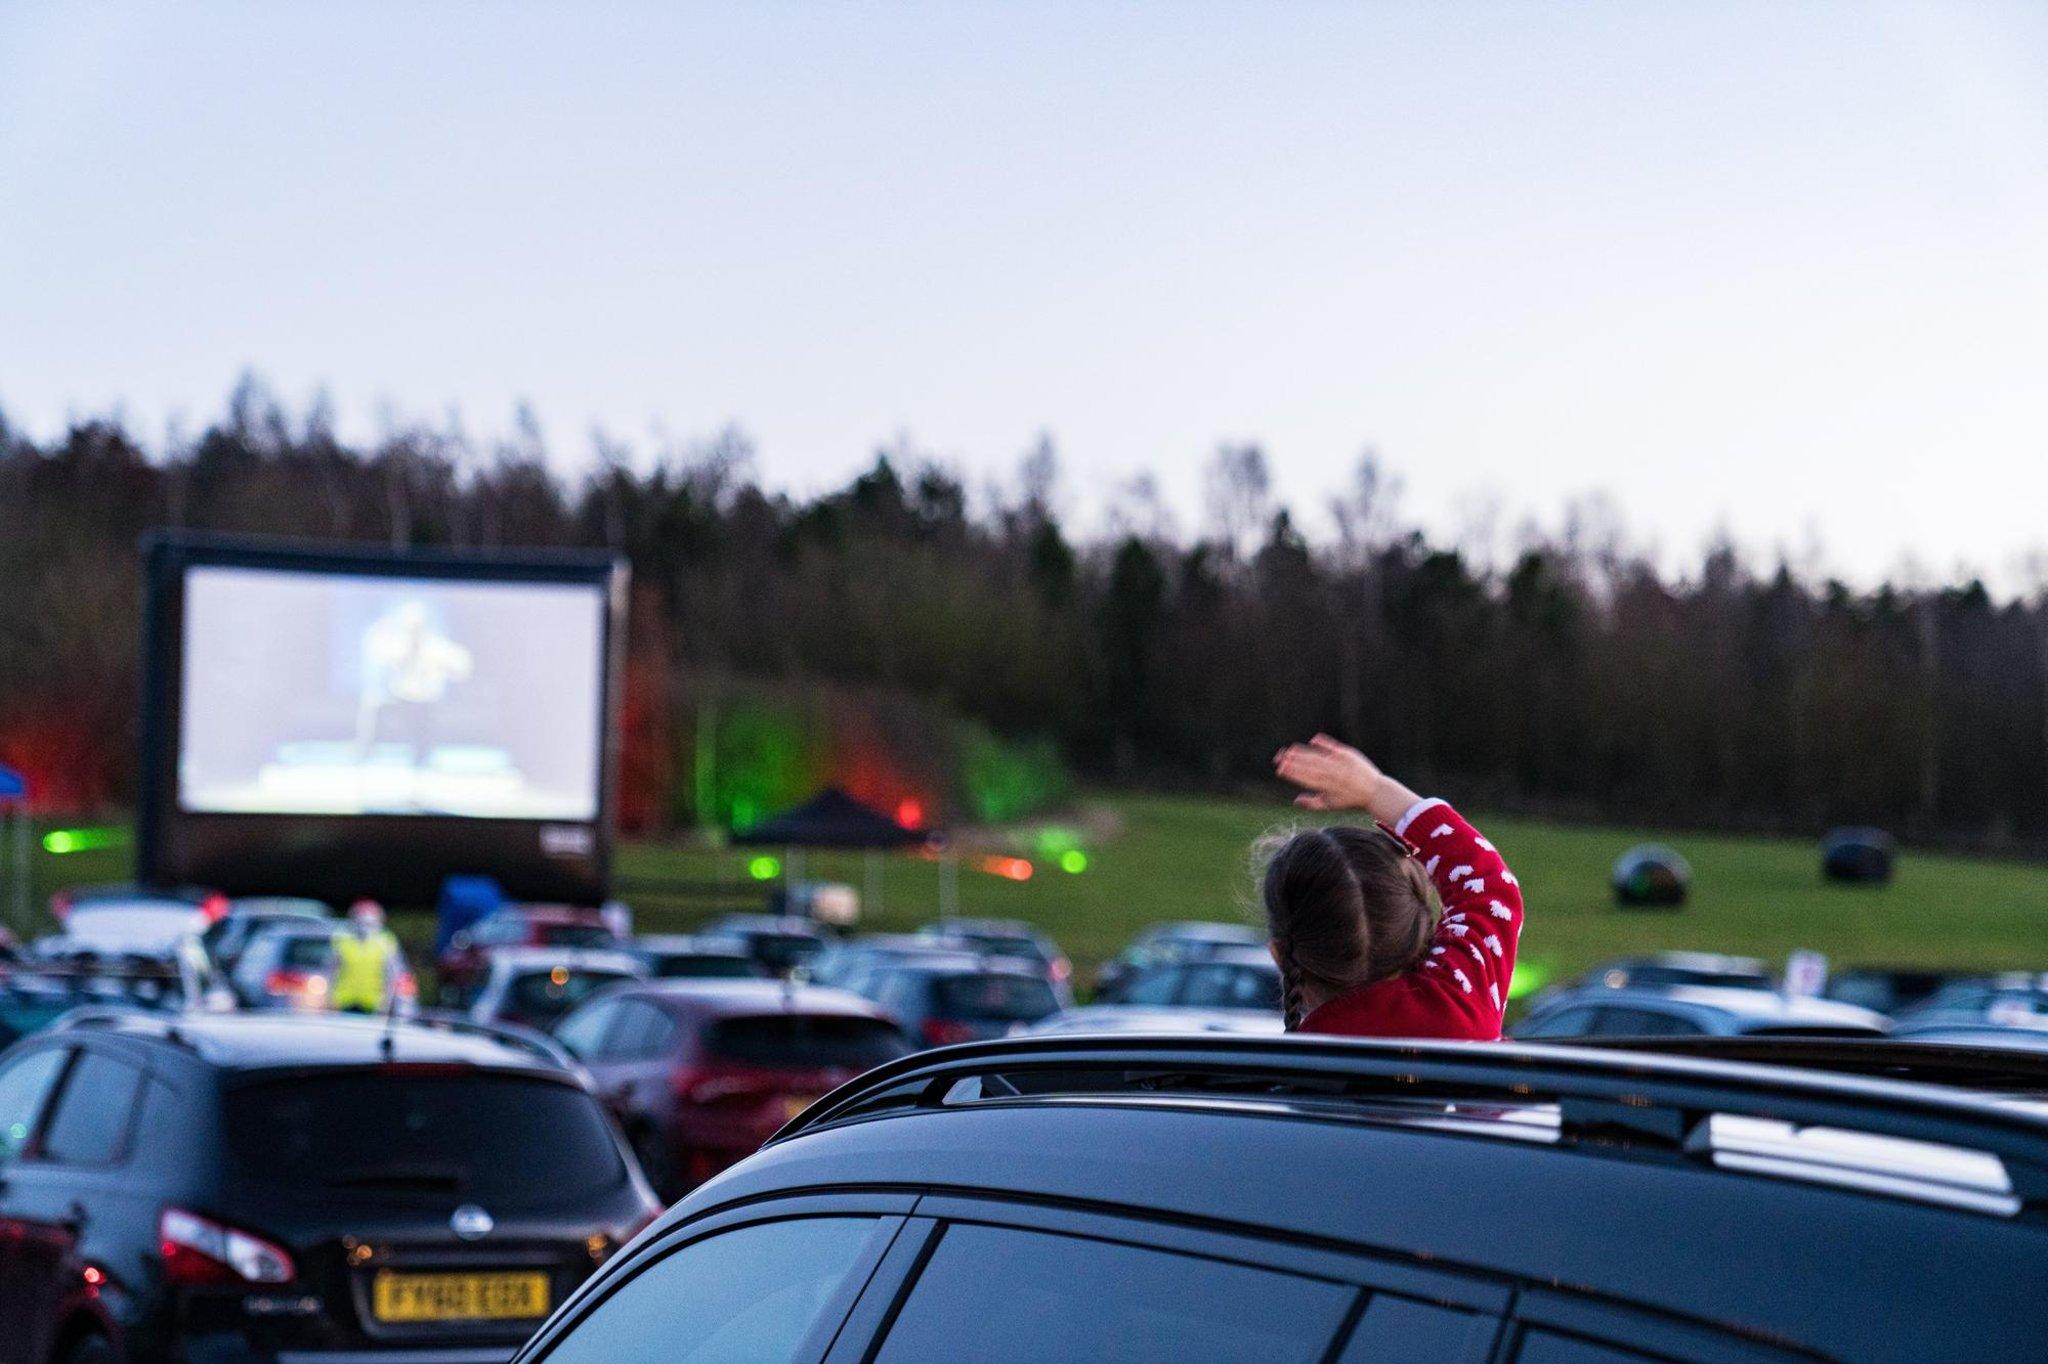 Socially distanced film fun at drive-thru cinema in...